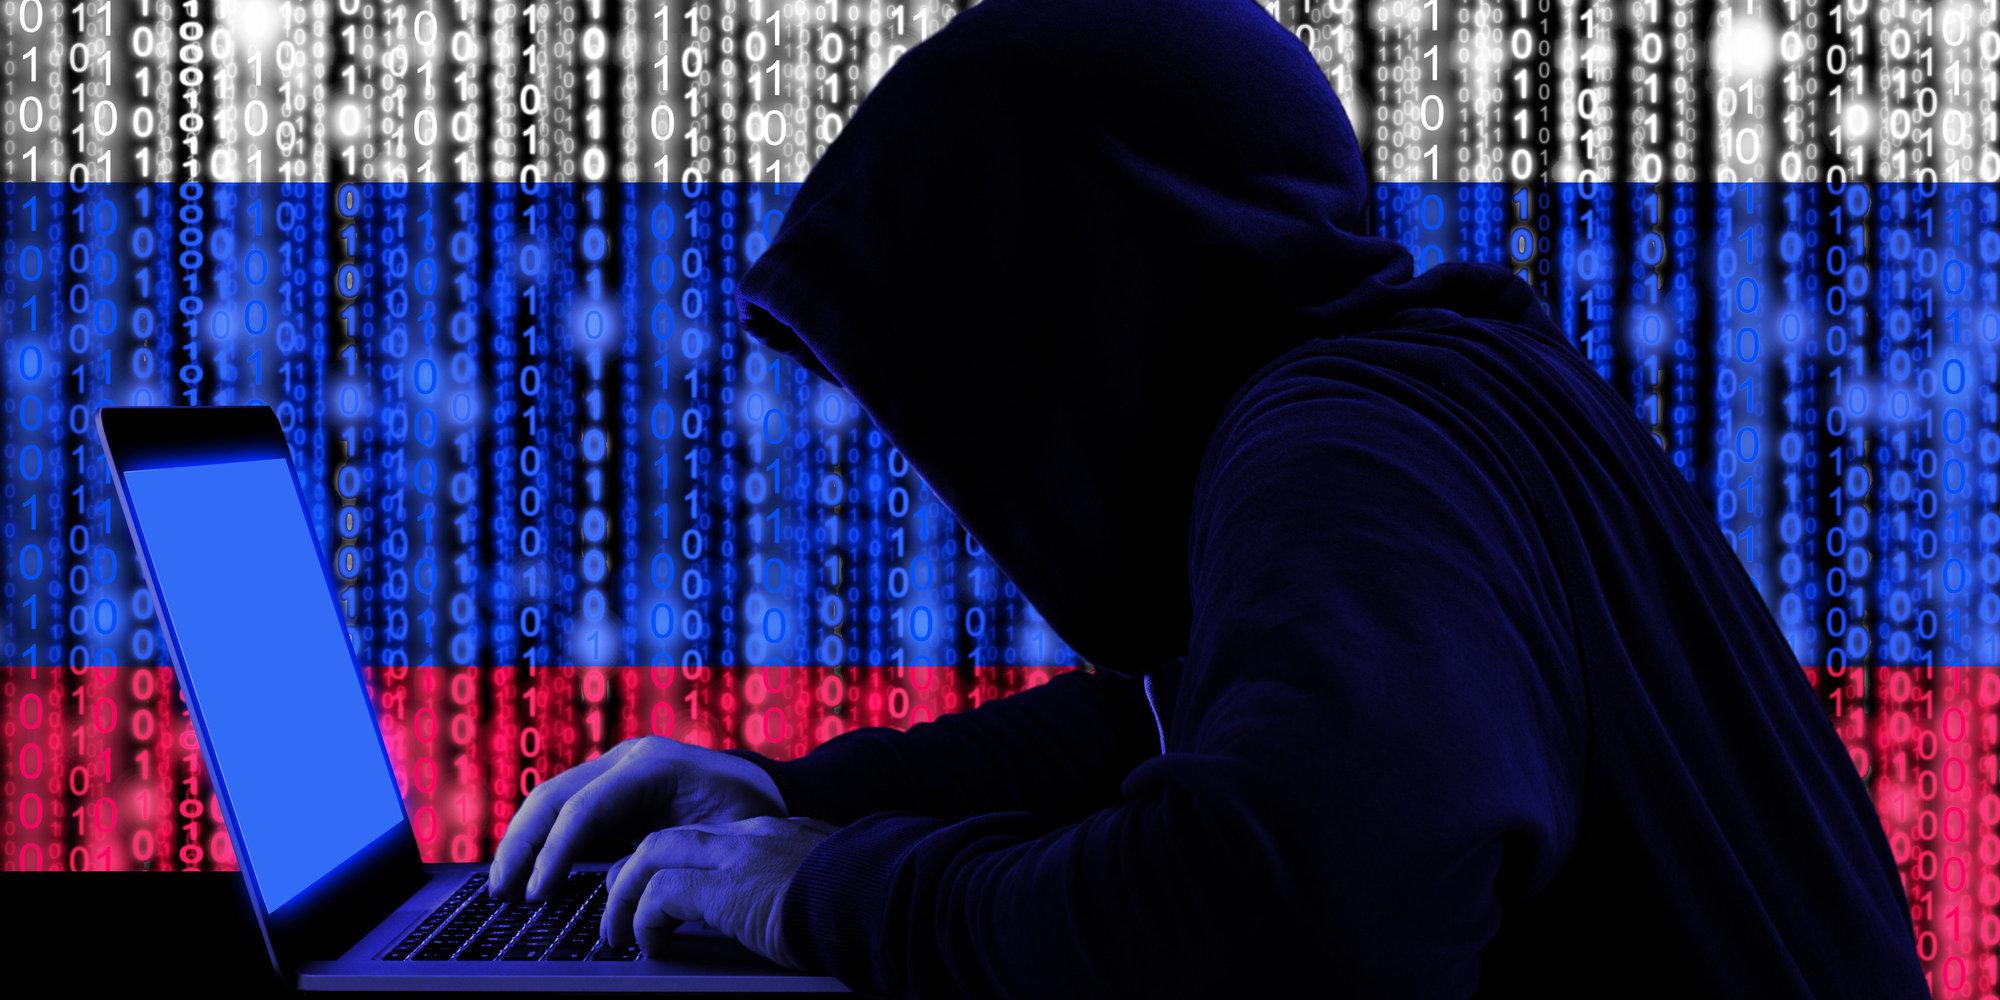 Se scoppiasse una guerra di troll e fake news?